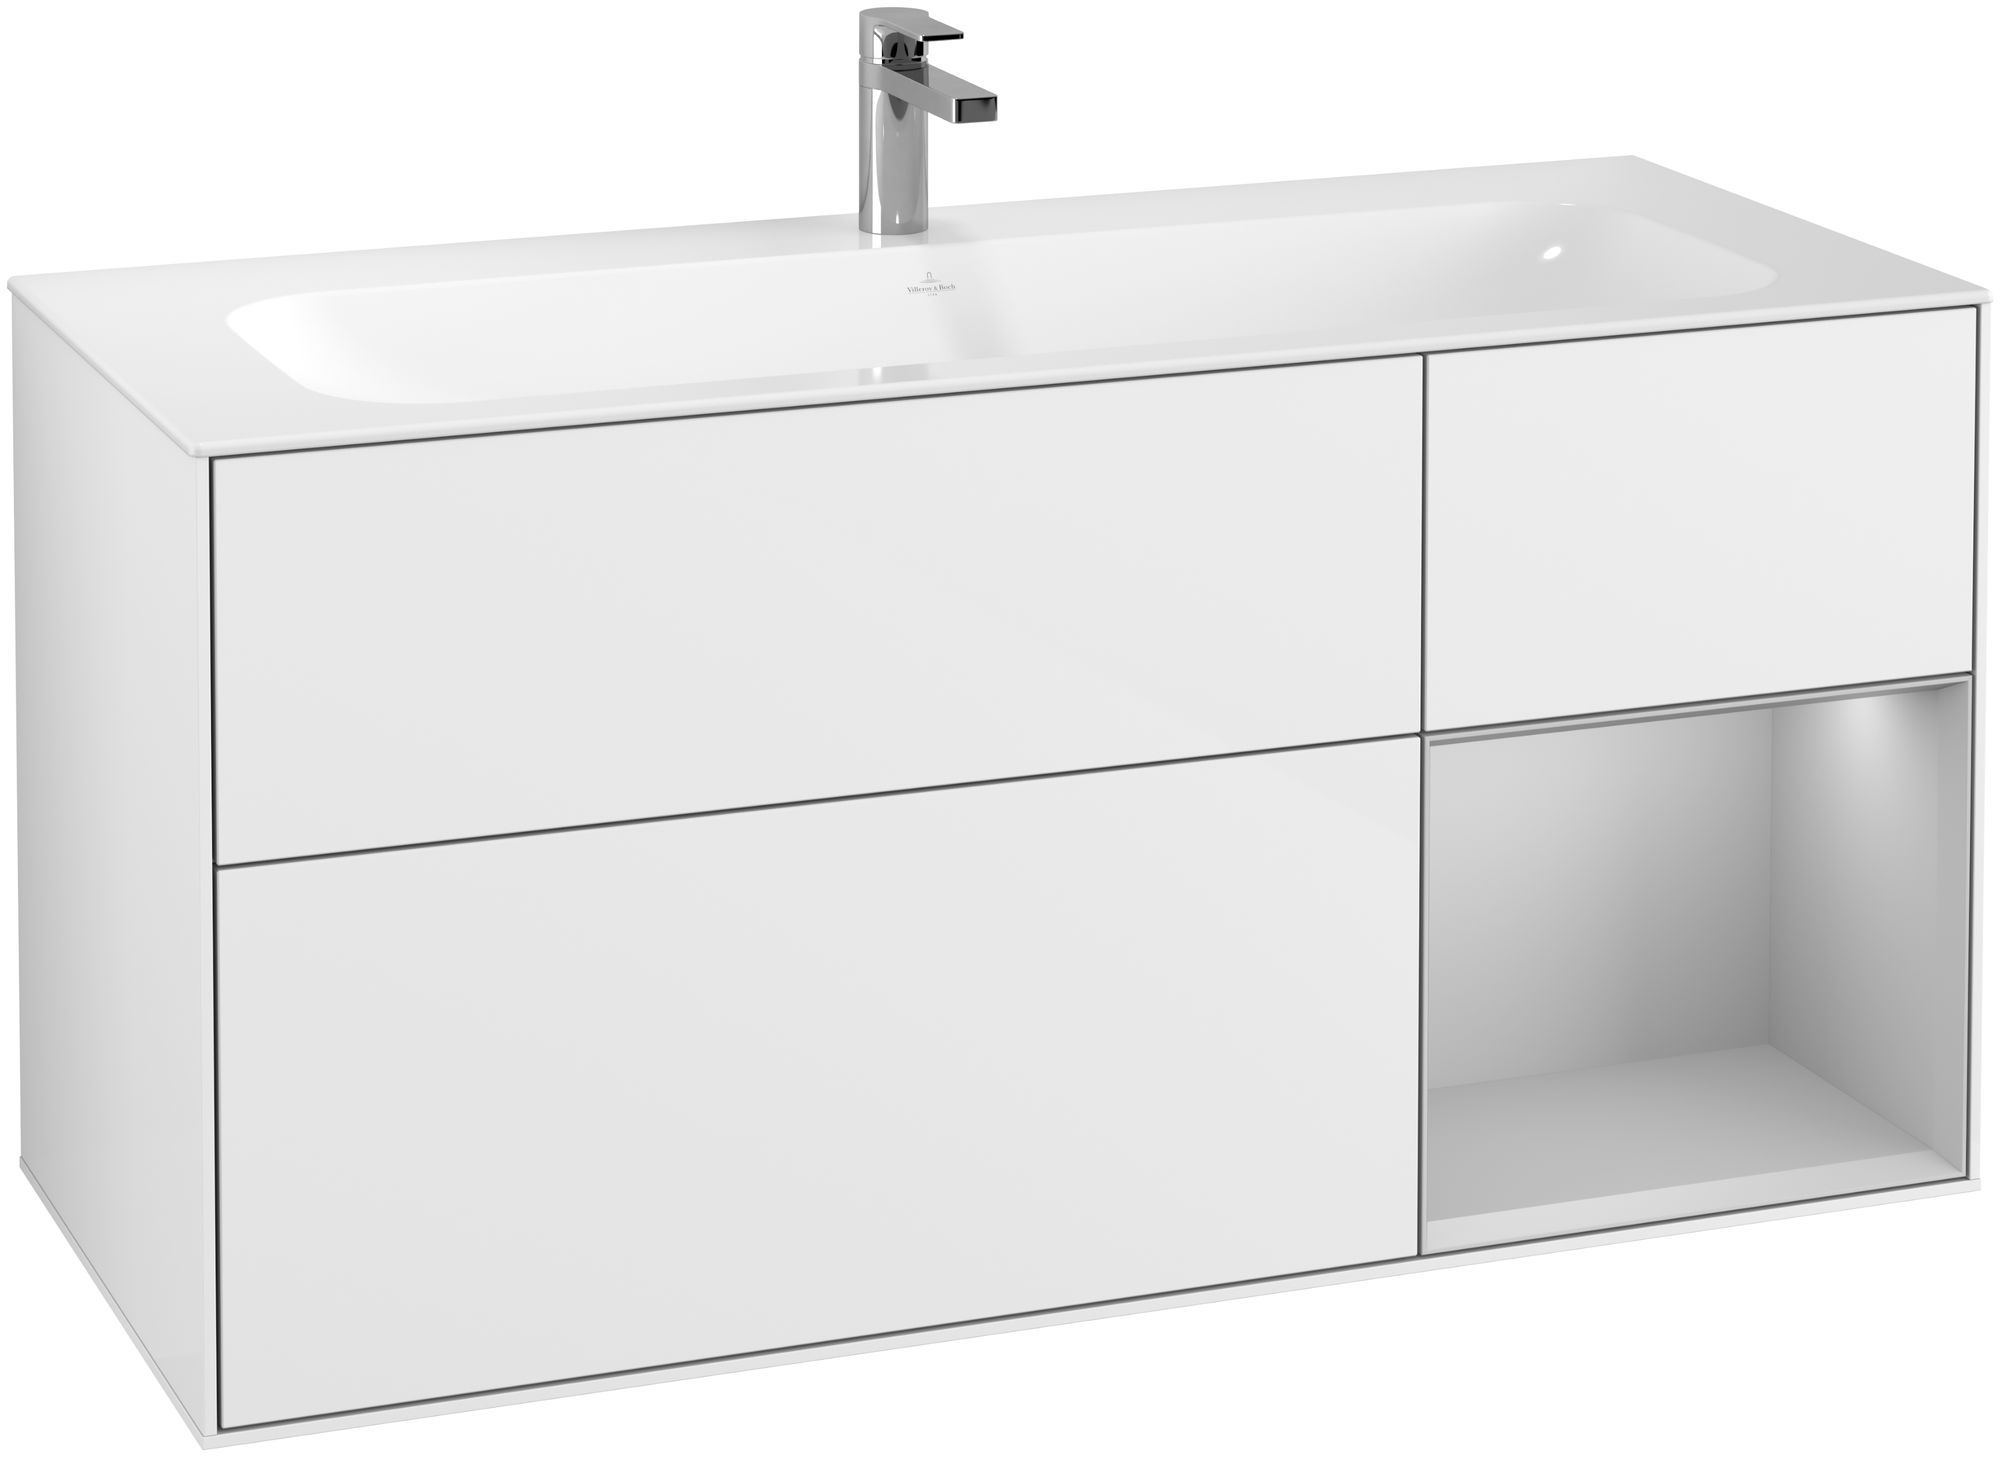 Villeroy & Boch Finion G07 Waschtischunterschrank mit Regalelement 3 Auszüge LED-Beleuchtung B:119,6xH:59,1xT:49,8cm Front, Korpus: Glossy White Lack, Regal: Light Grey Matt G070GJGF